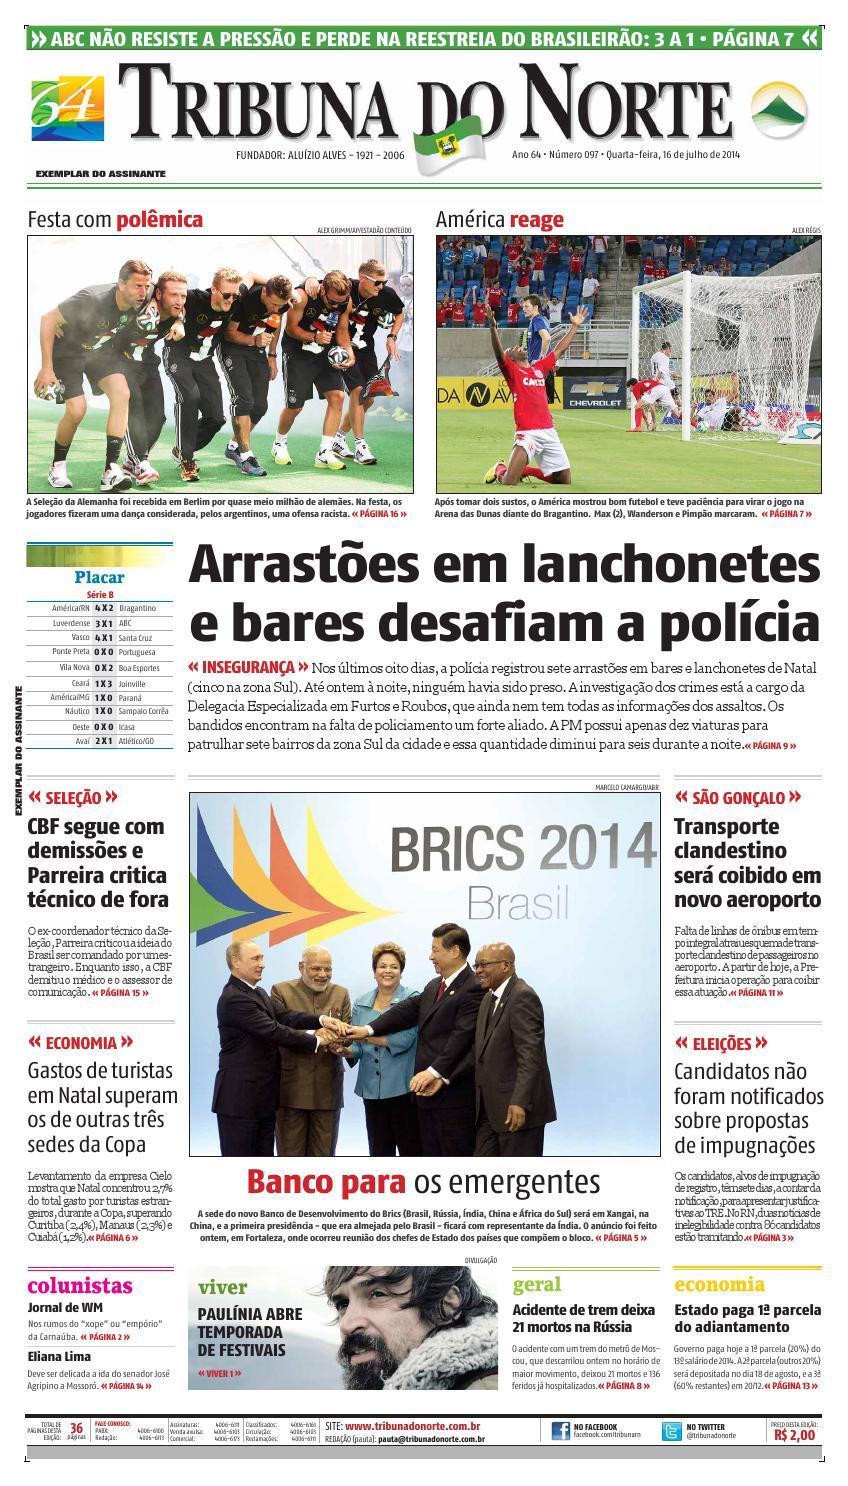 04a04ef01c Tribuna do Norte - 16 07 2014 by Empresa Jornalística Tribuna do Norte Ltda  - issuu